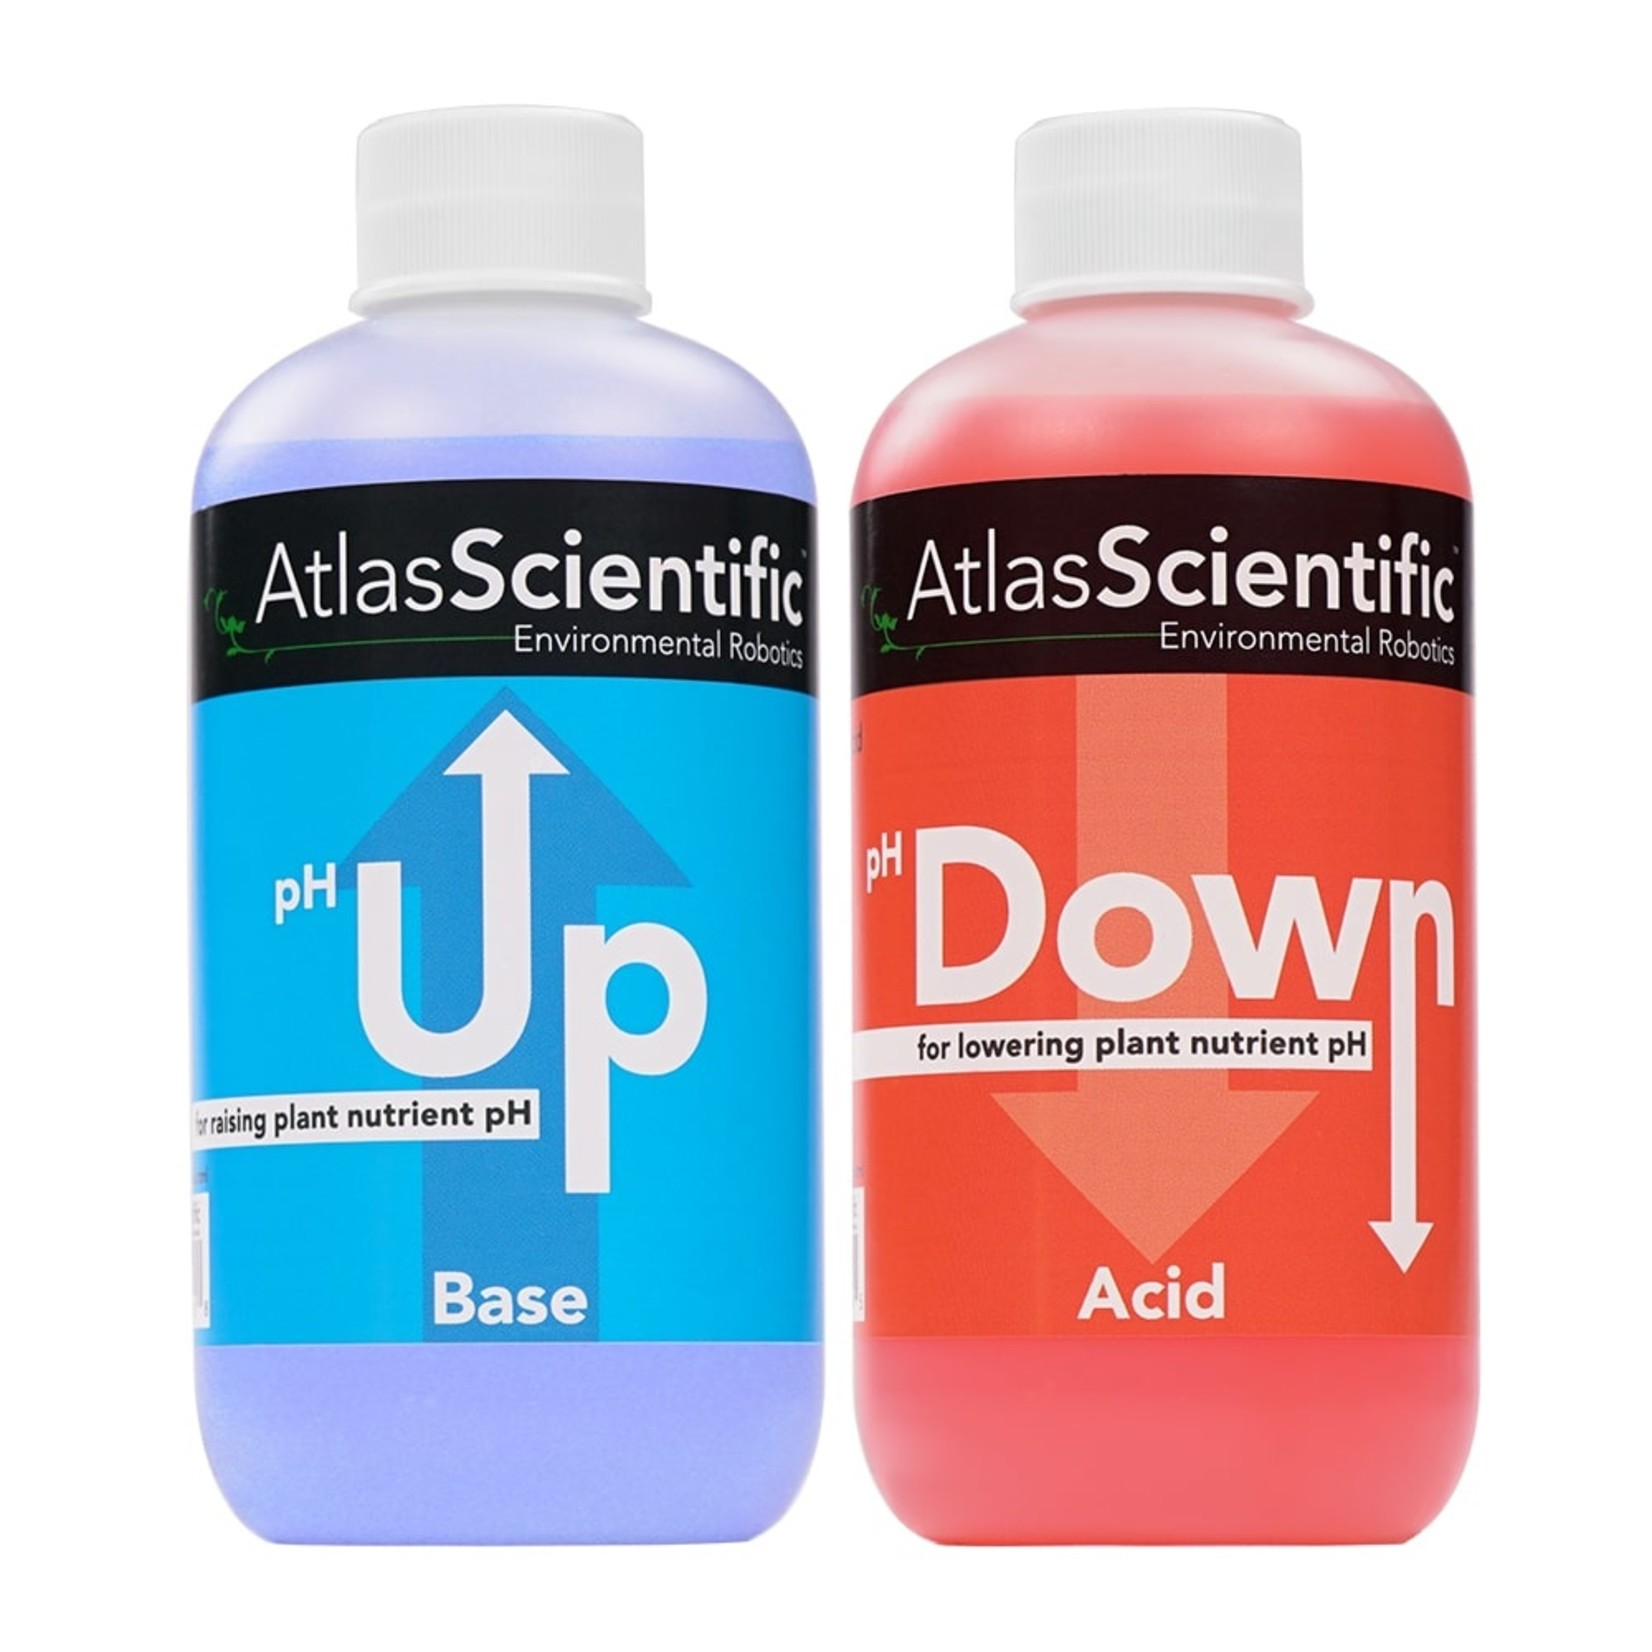 Atlas Scientific pH Up and pH Down 2x 1 L bottle